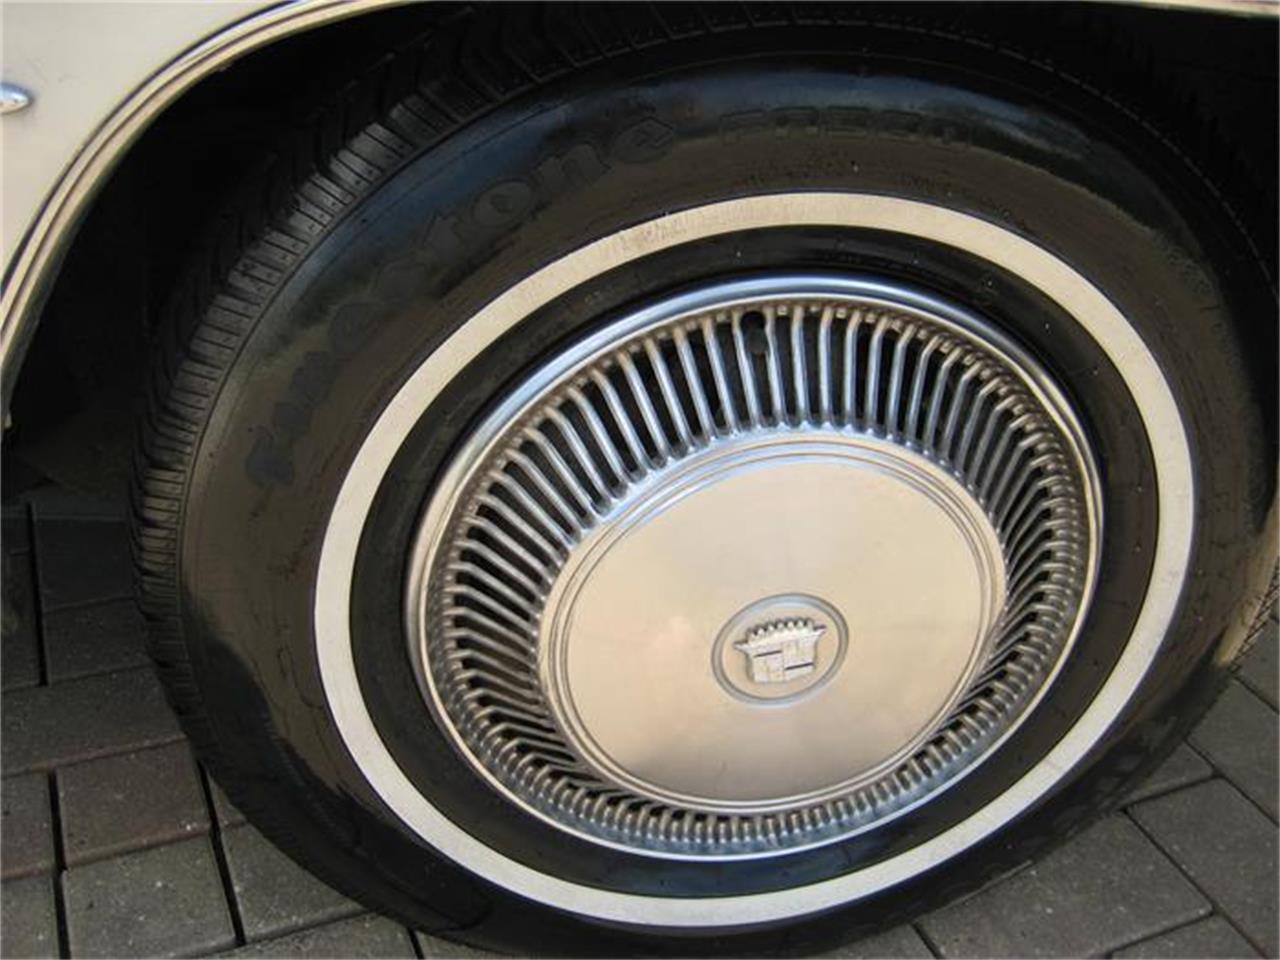 Large Picture of 1975 Cadillac Eldorado - $12,995.00 - E9SK